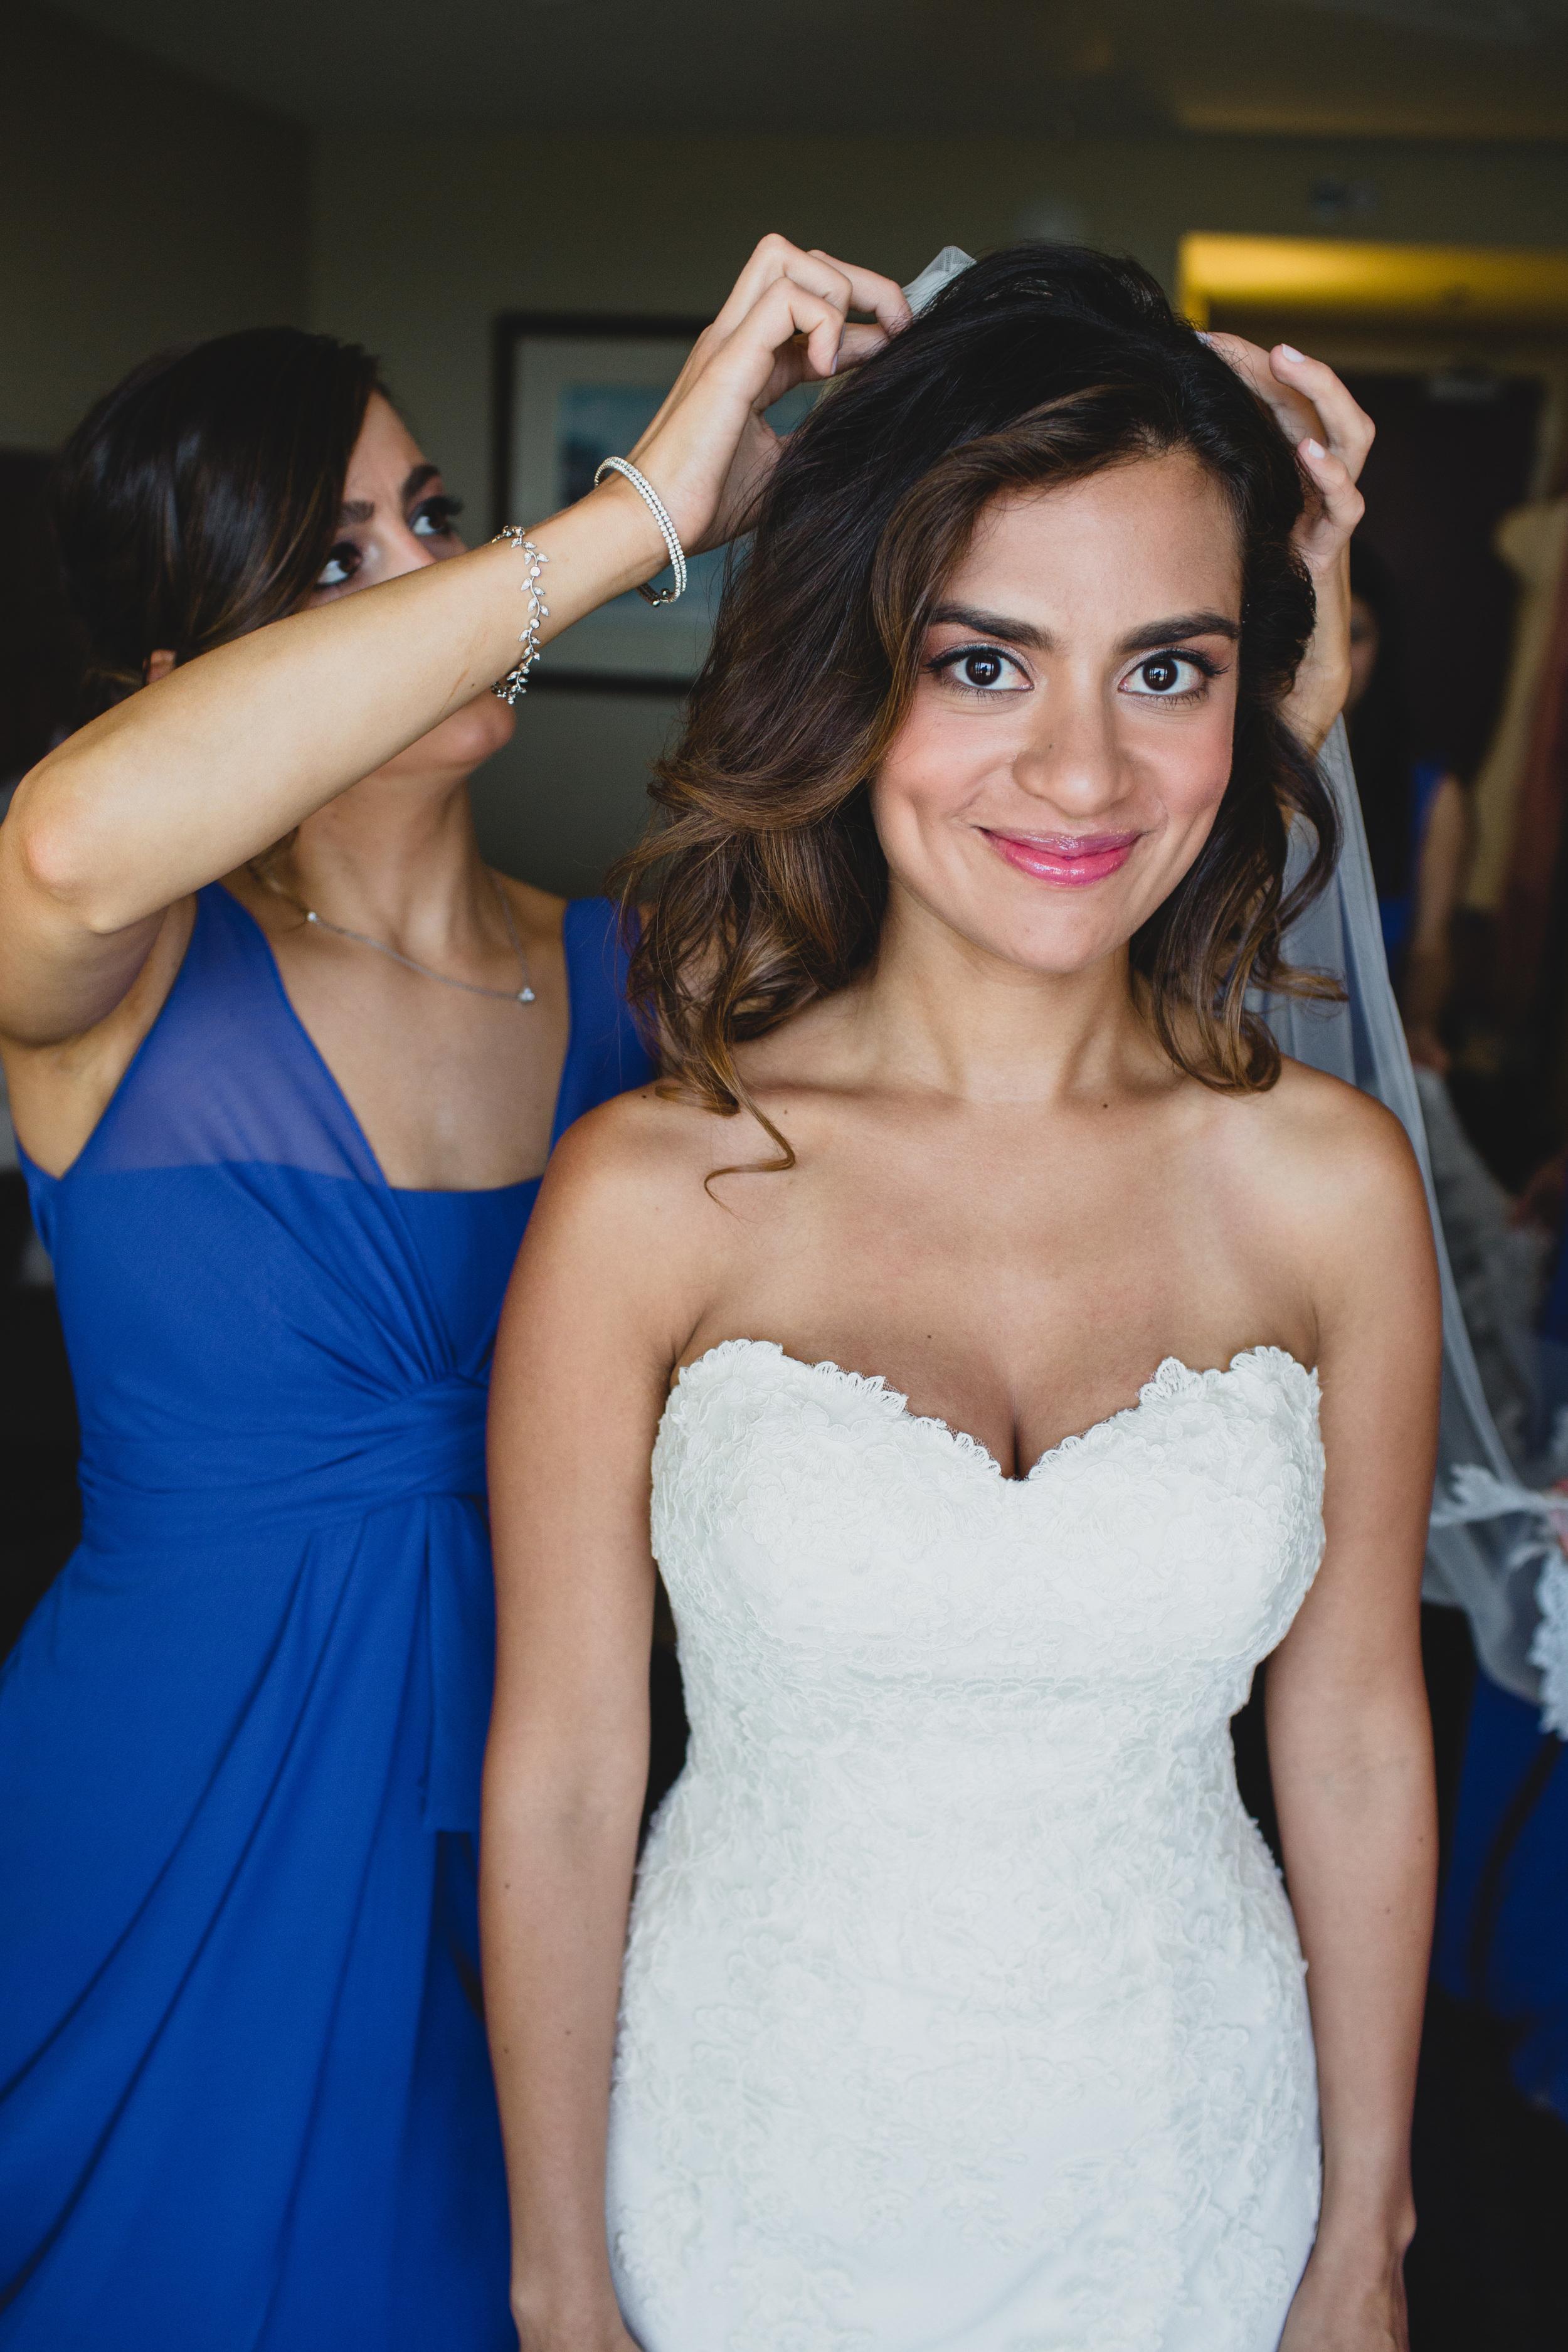 Danica+++Gus+Wedding-174-2644027304-O.jpg